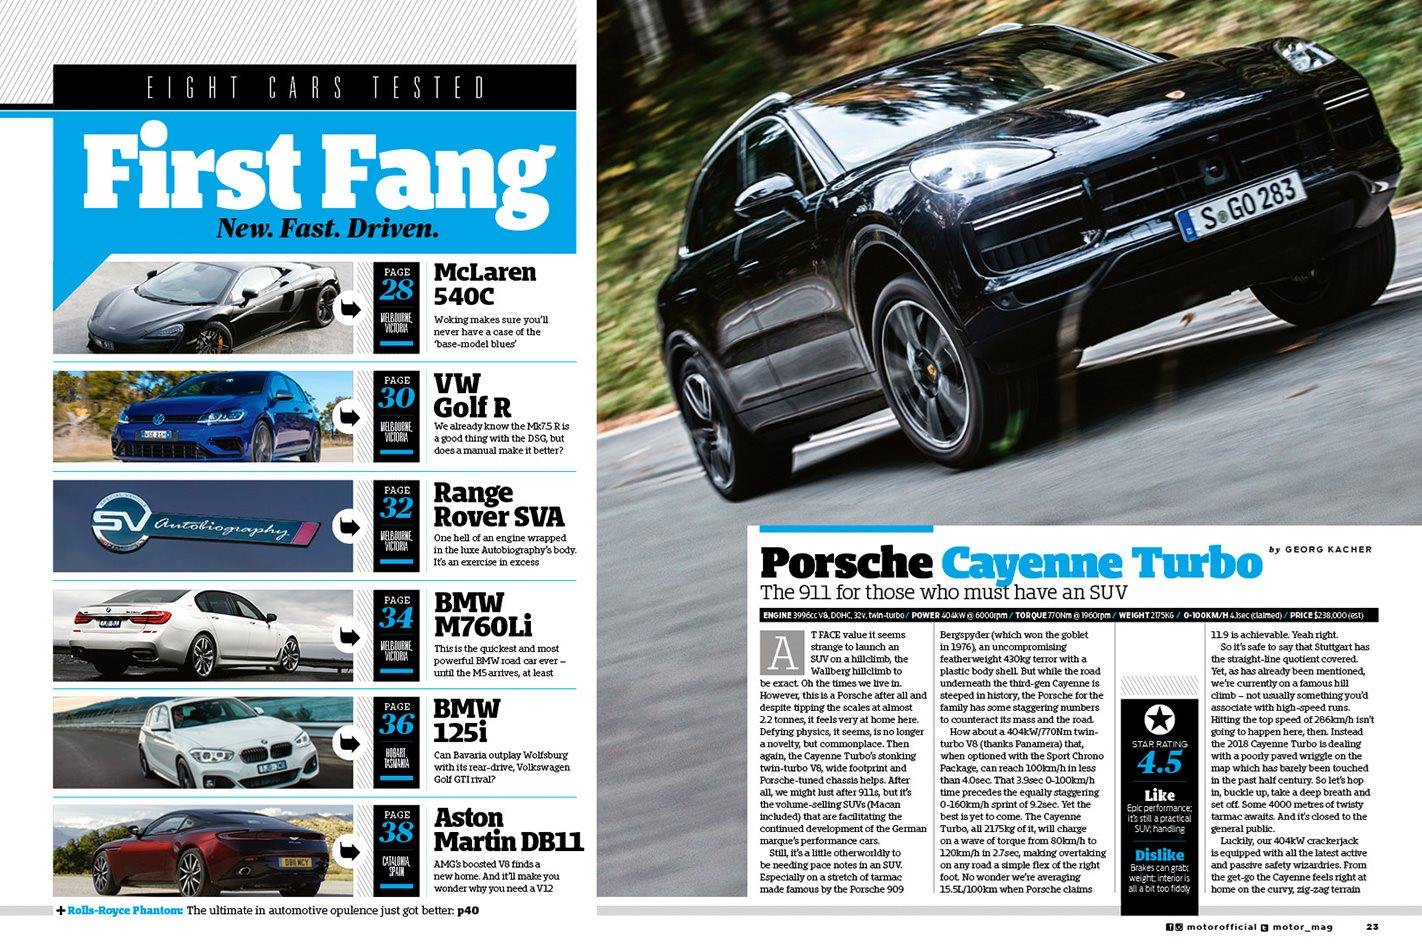 Porsche Cayenne Turbo review